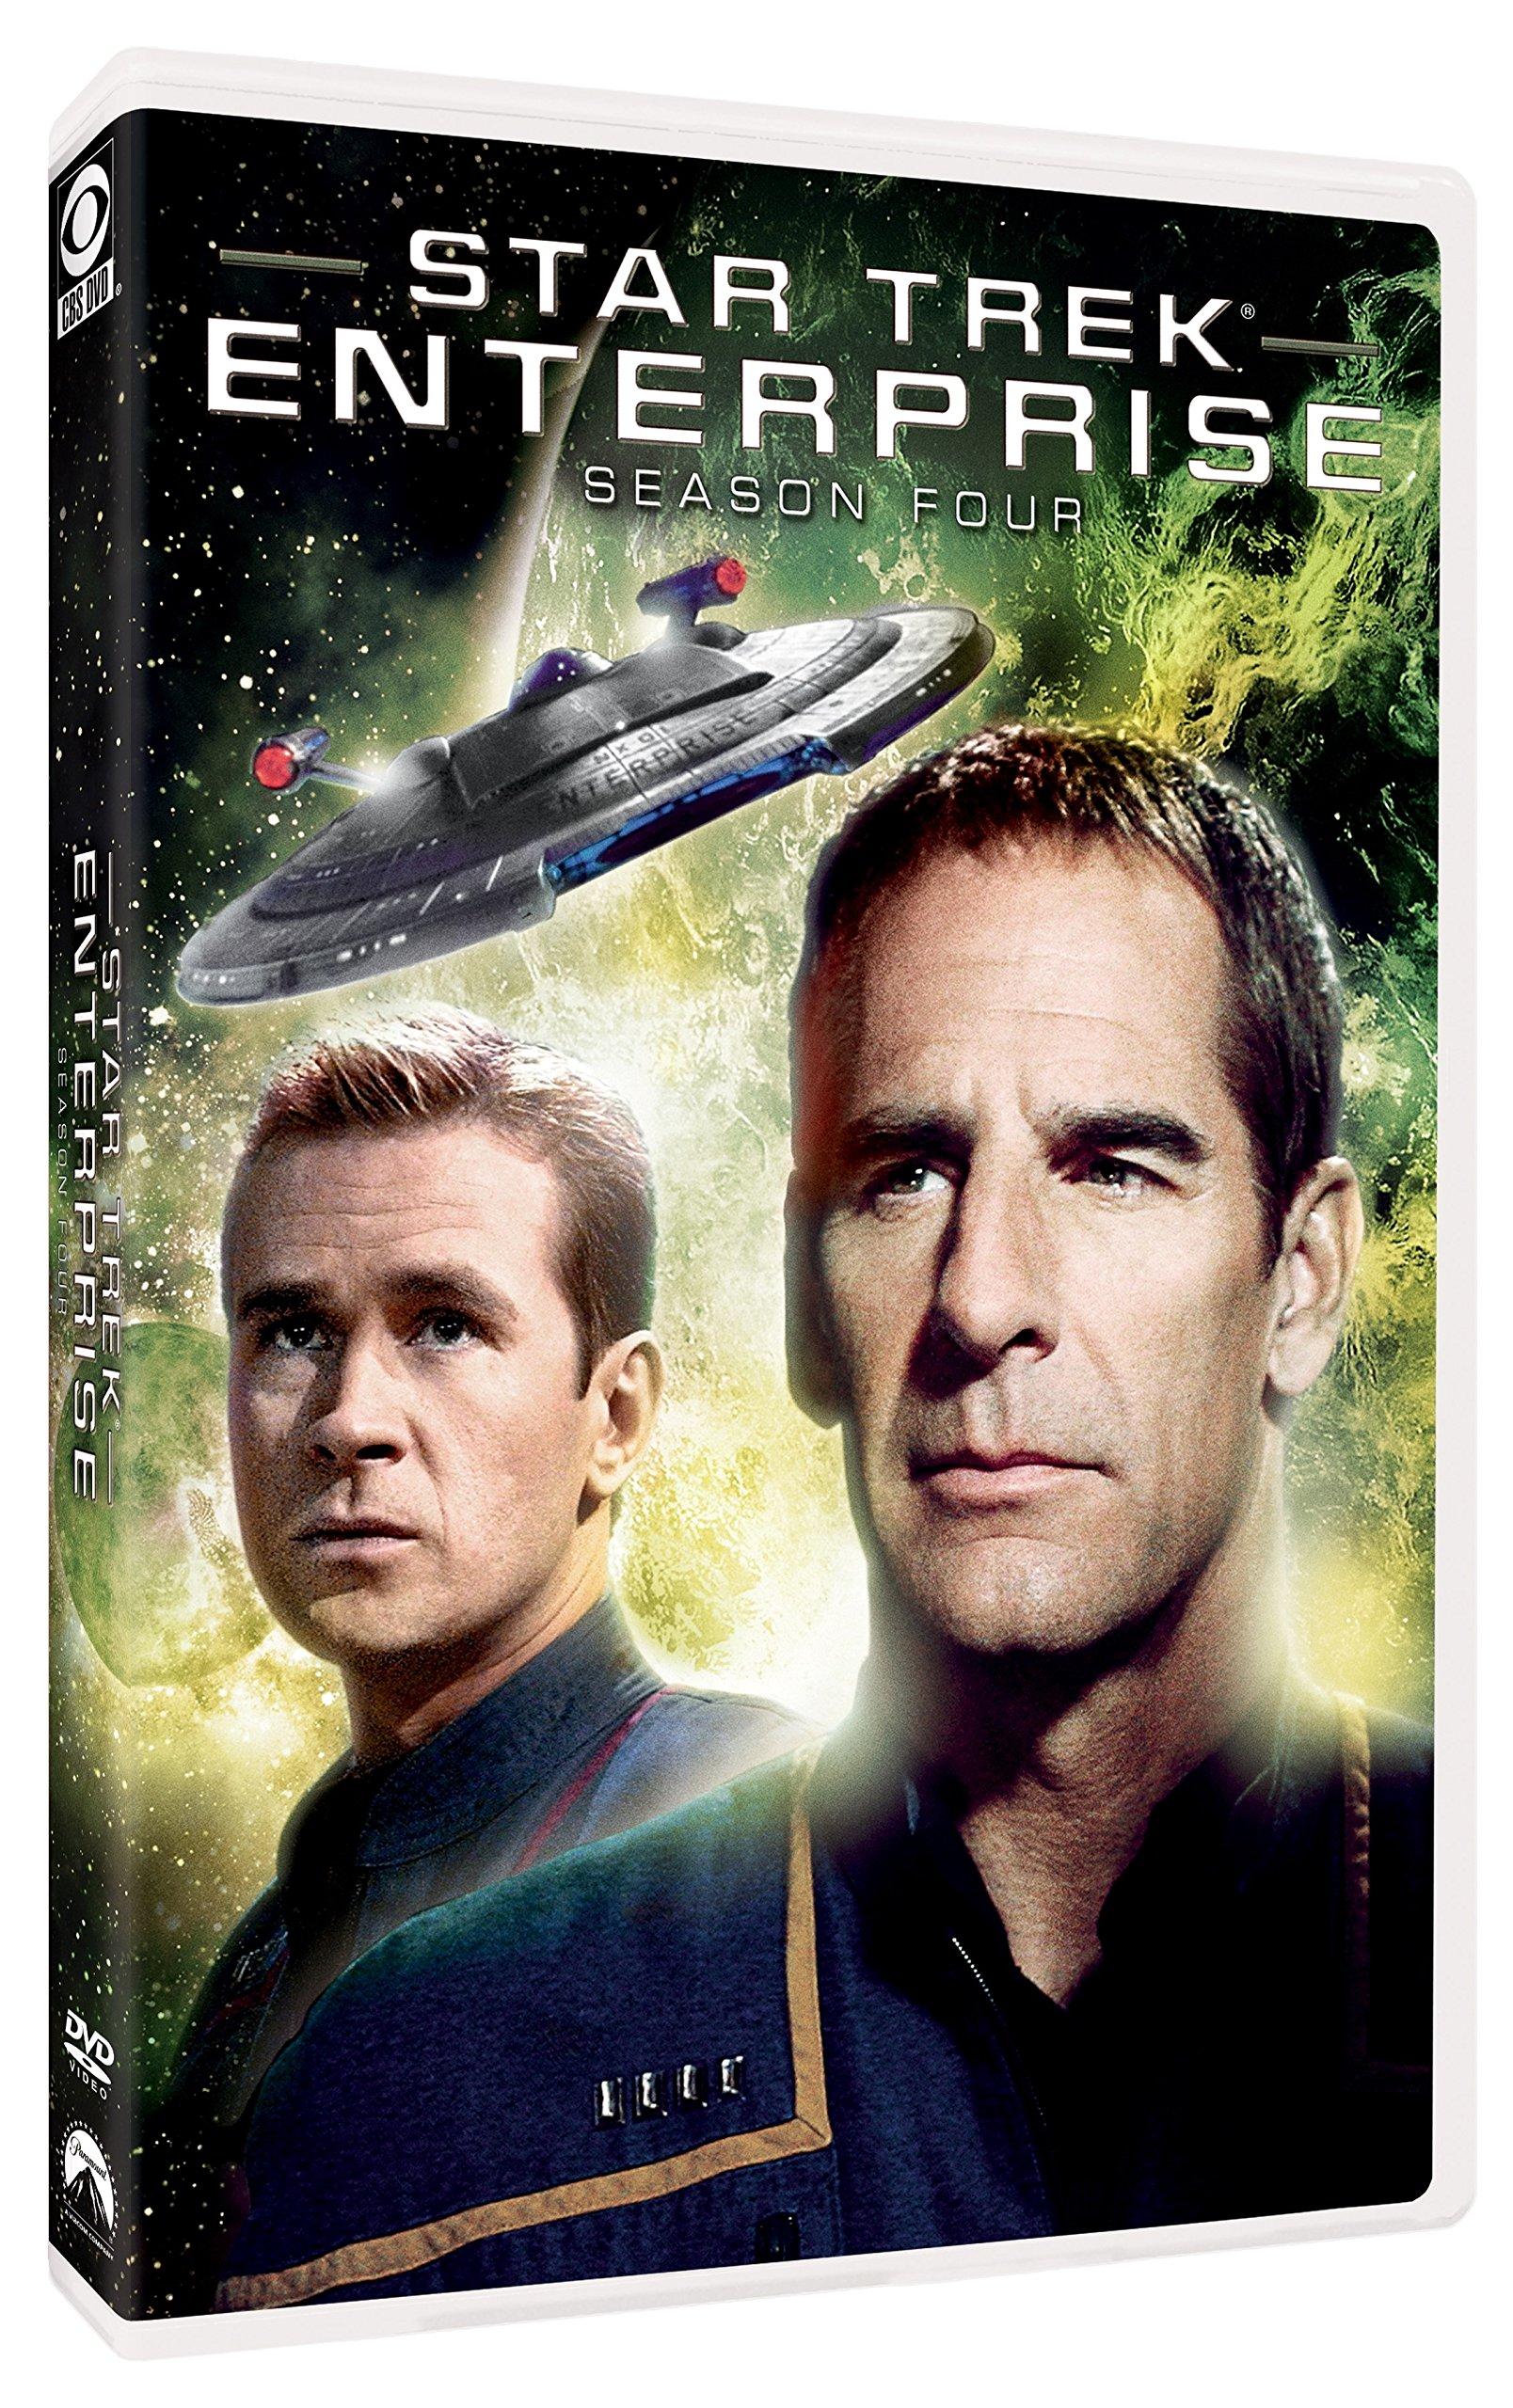 DVD : Star Trek: Enterprise: The Complete Fourth Season (Boxed Set, AC-3, Repackaged, Widescreen, )